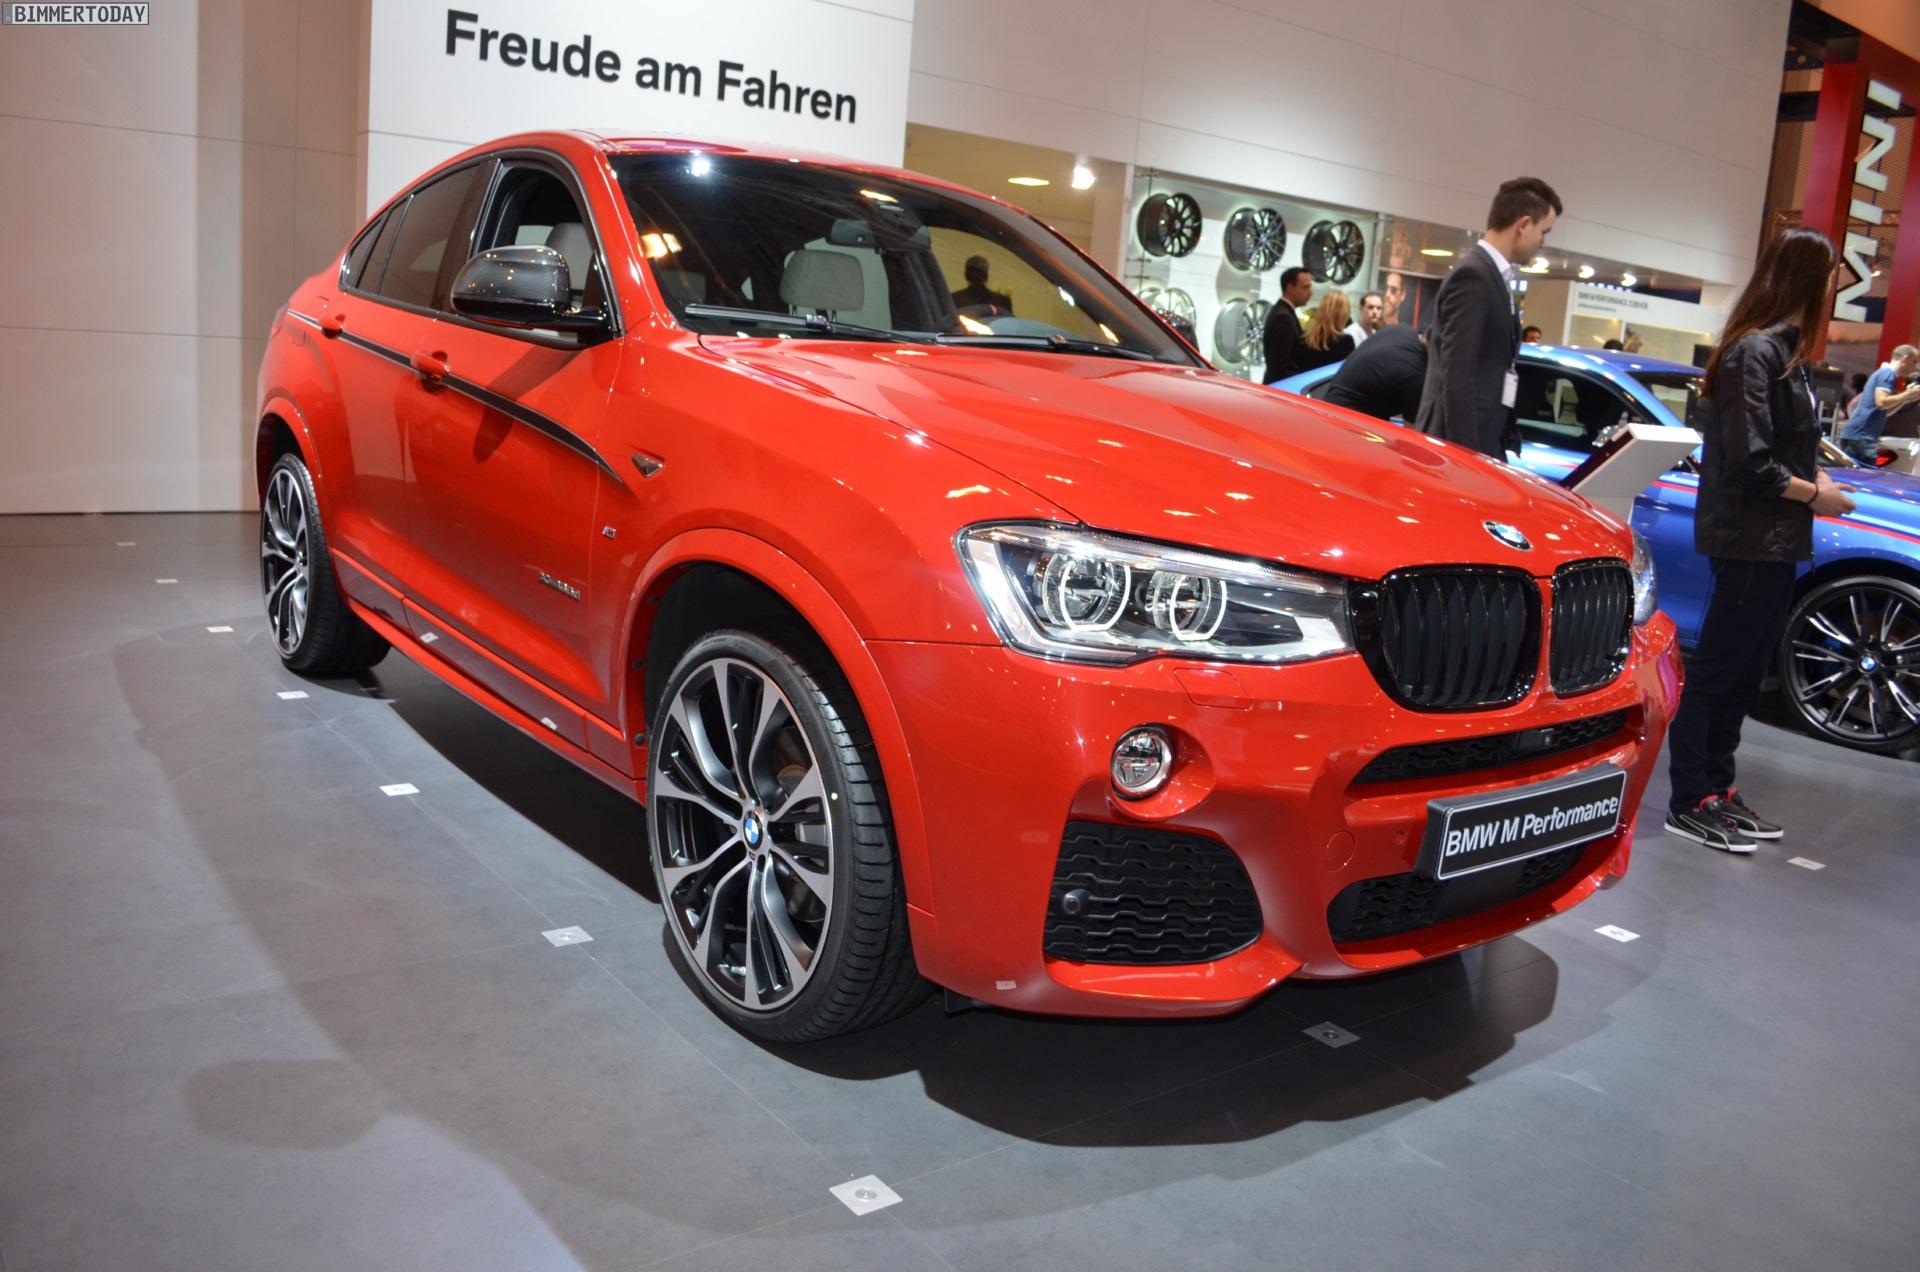 BMW M Performance BMW X4 F26 Melbourne Rot Essen 2014 01